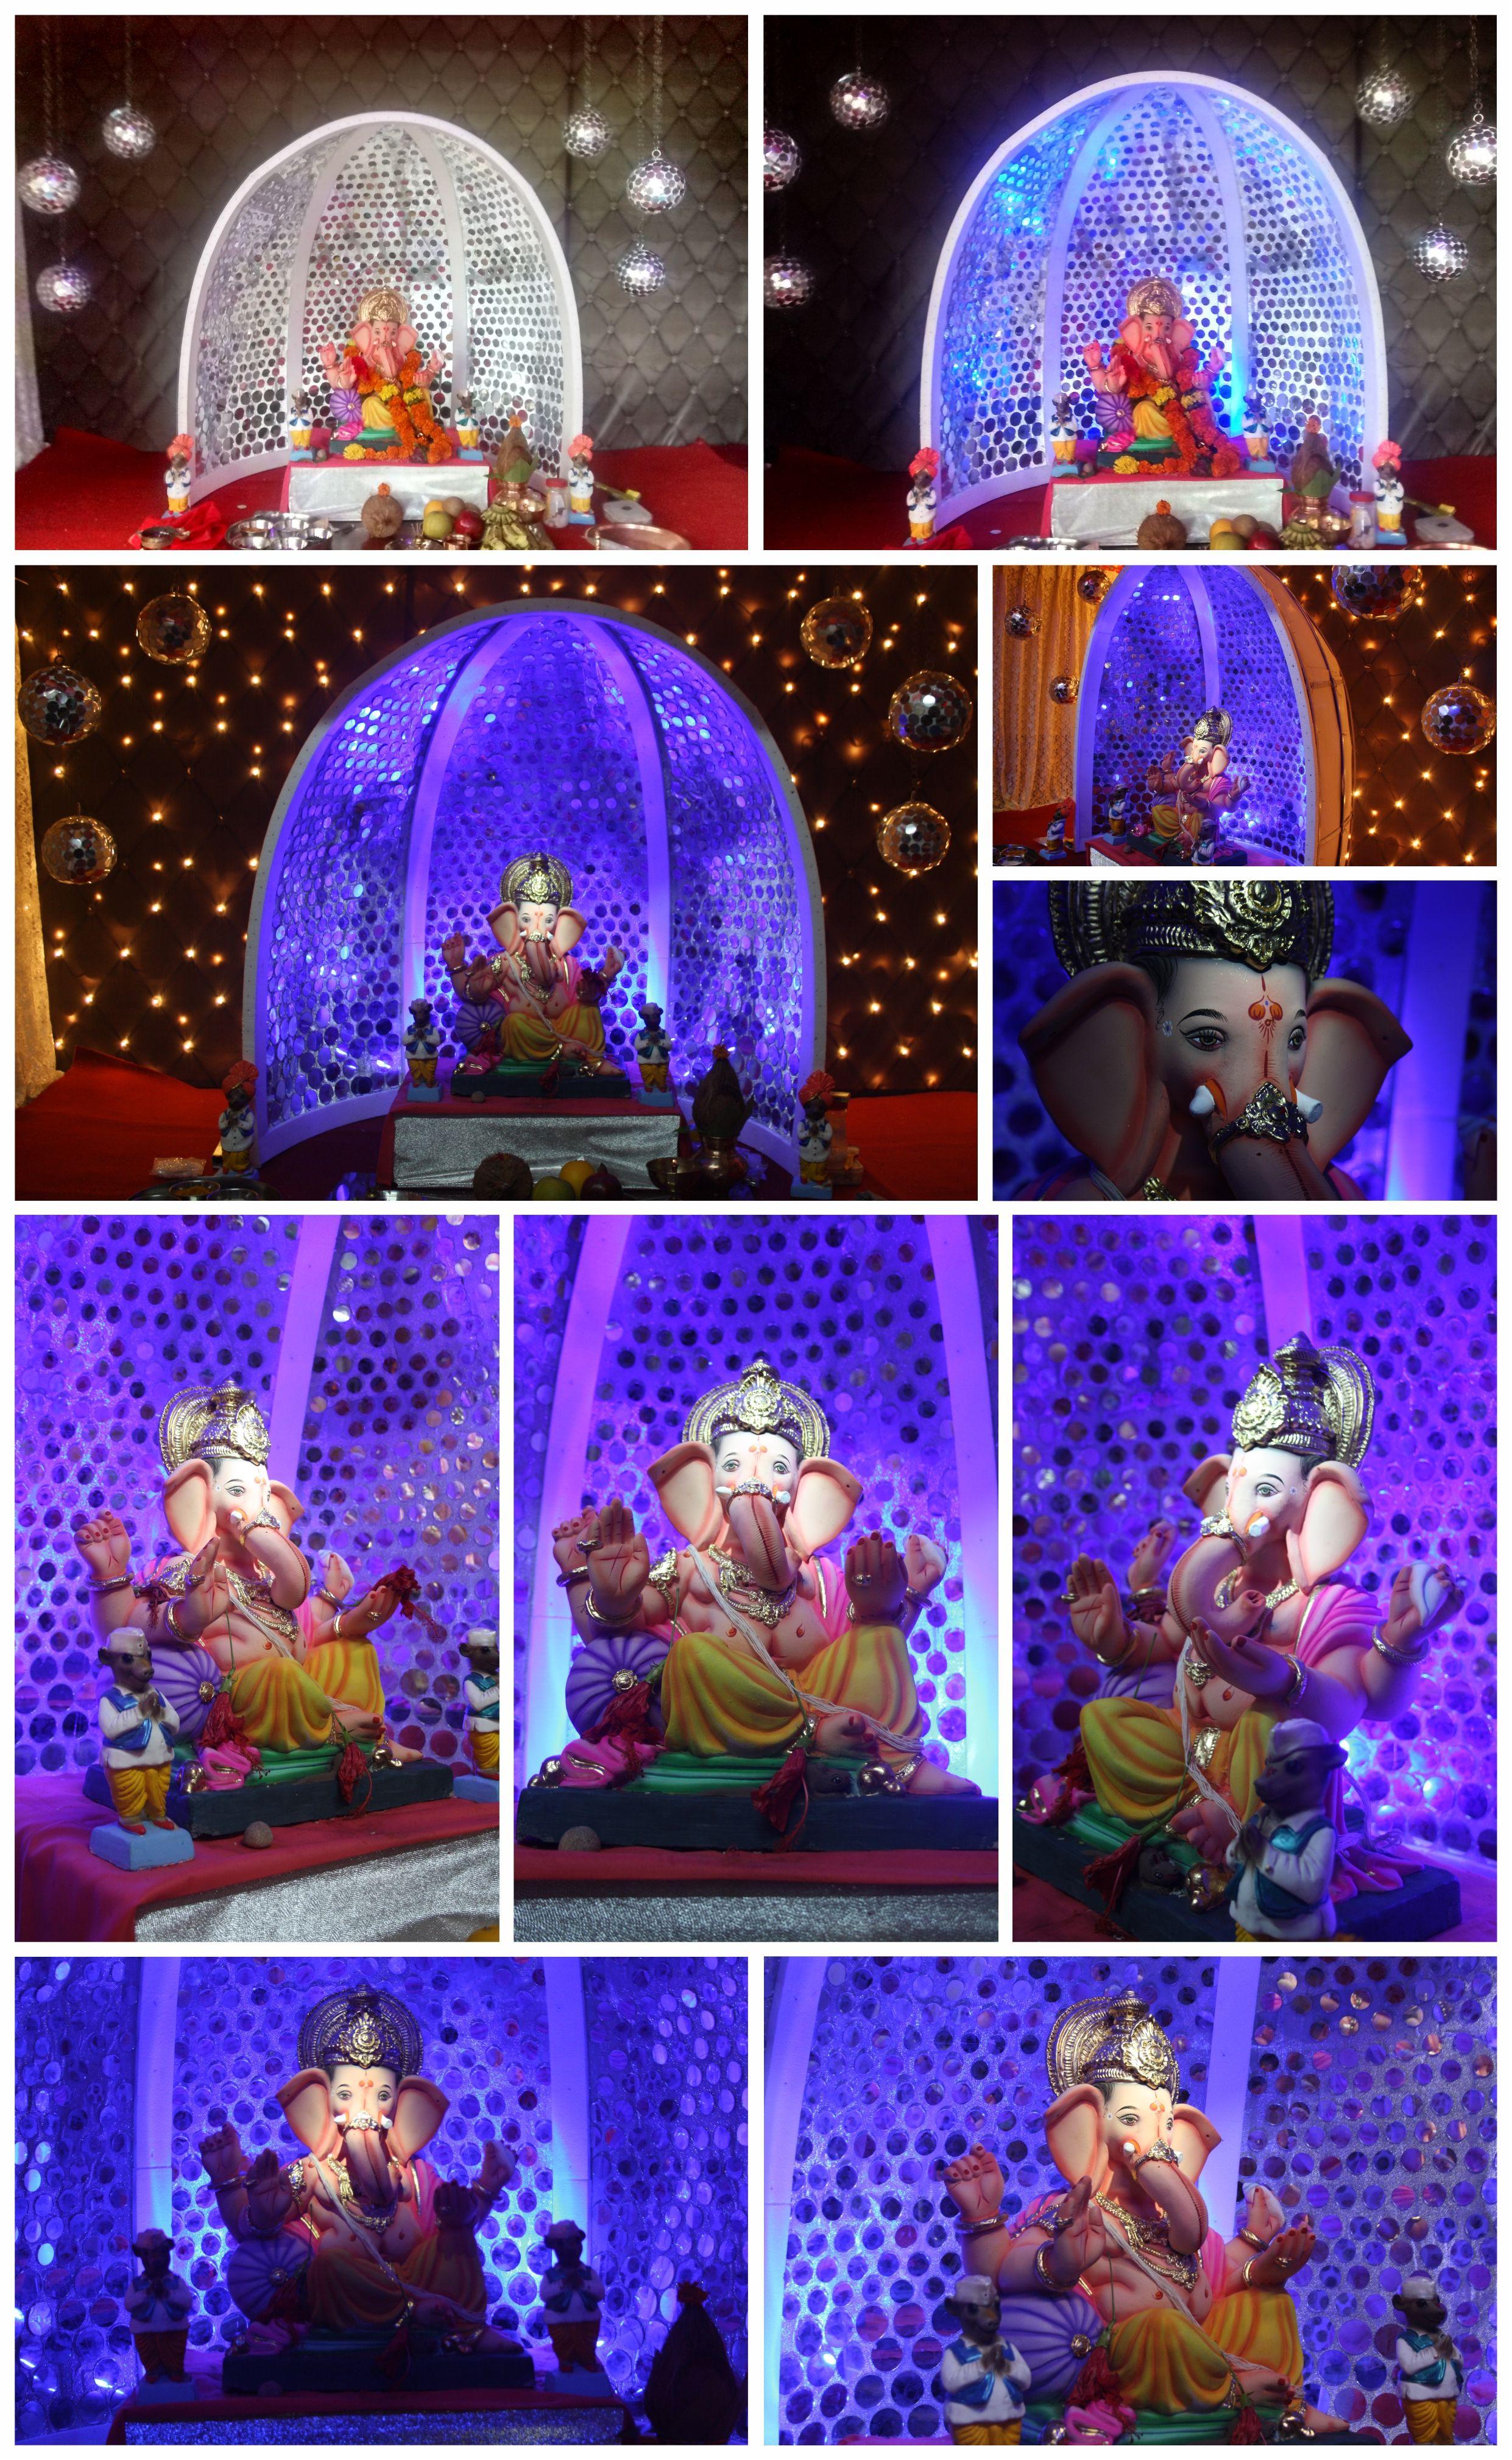 Ganapati Decoration Ganpati Decoration At Home Ganesh